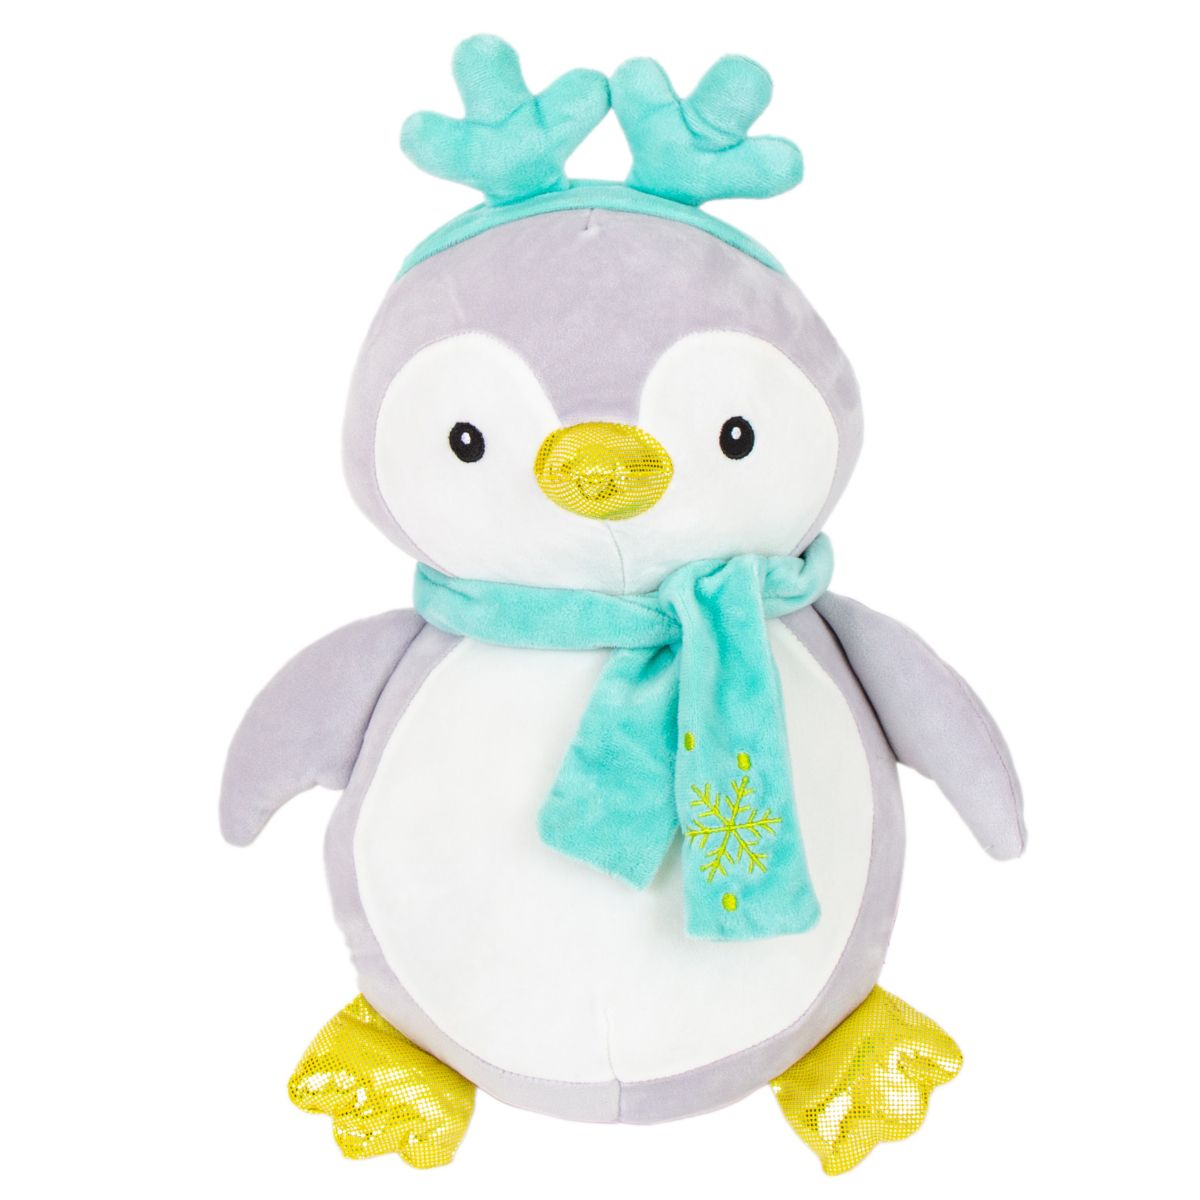 Jucarie de plus, Noriel Plush, Pinguin cu coronita, 38 cm